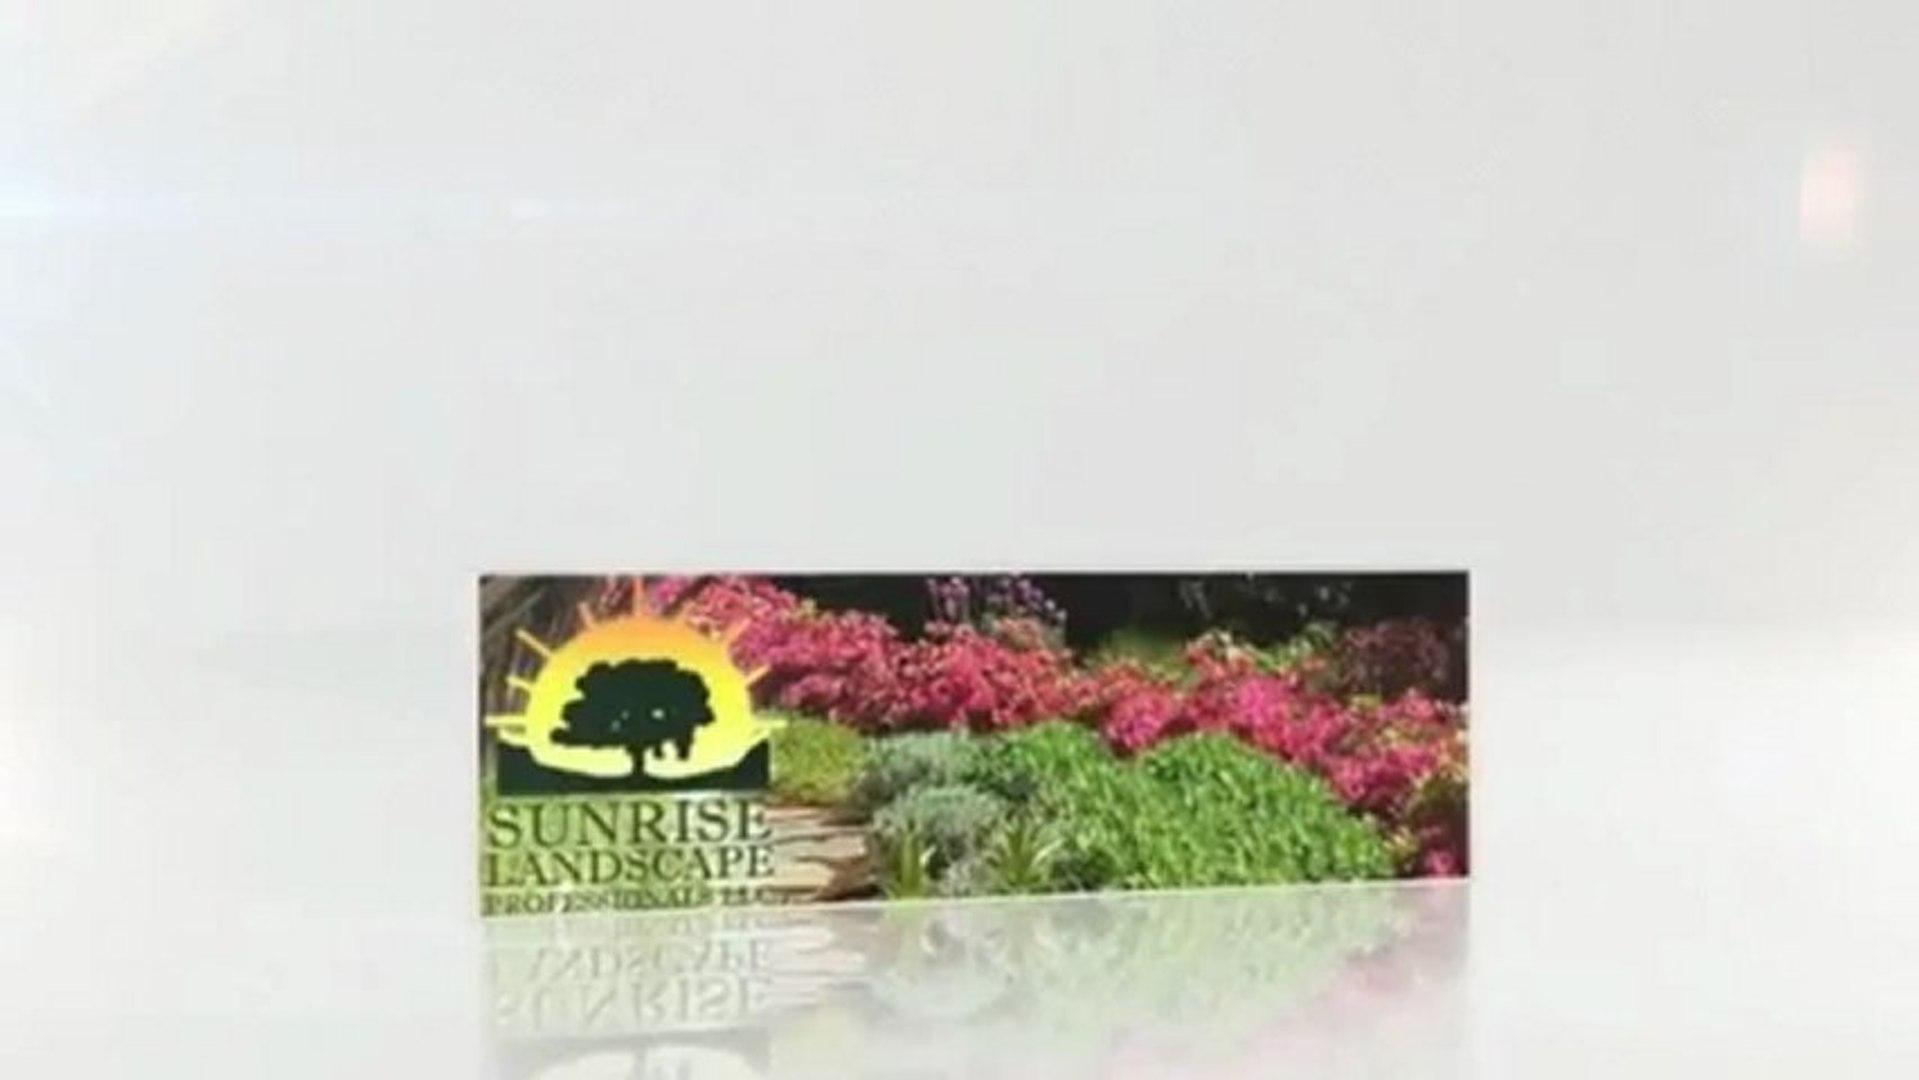 Sunrise Landscape Professional (503) 658-1828